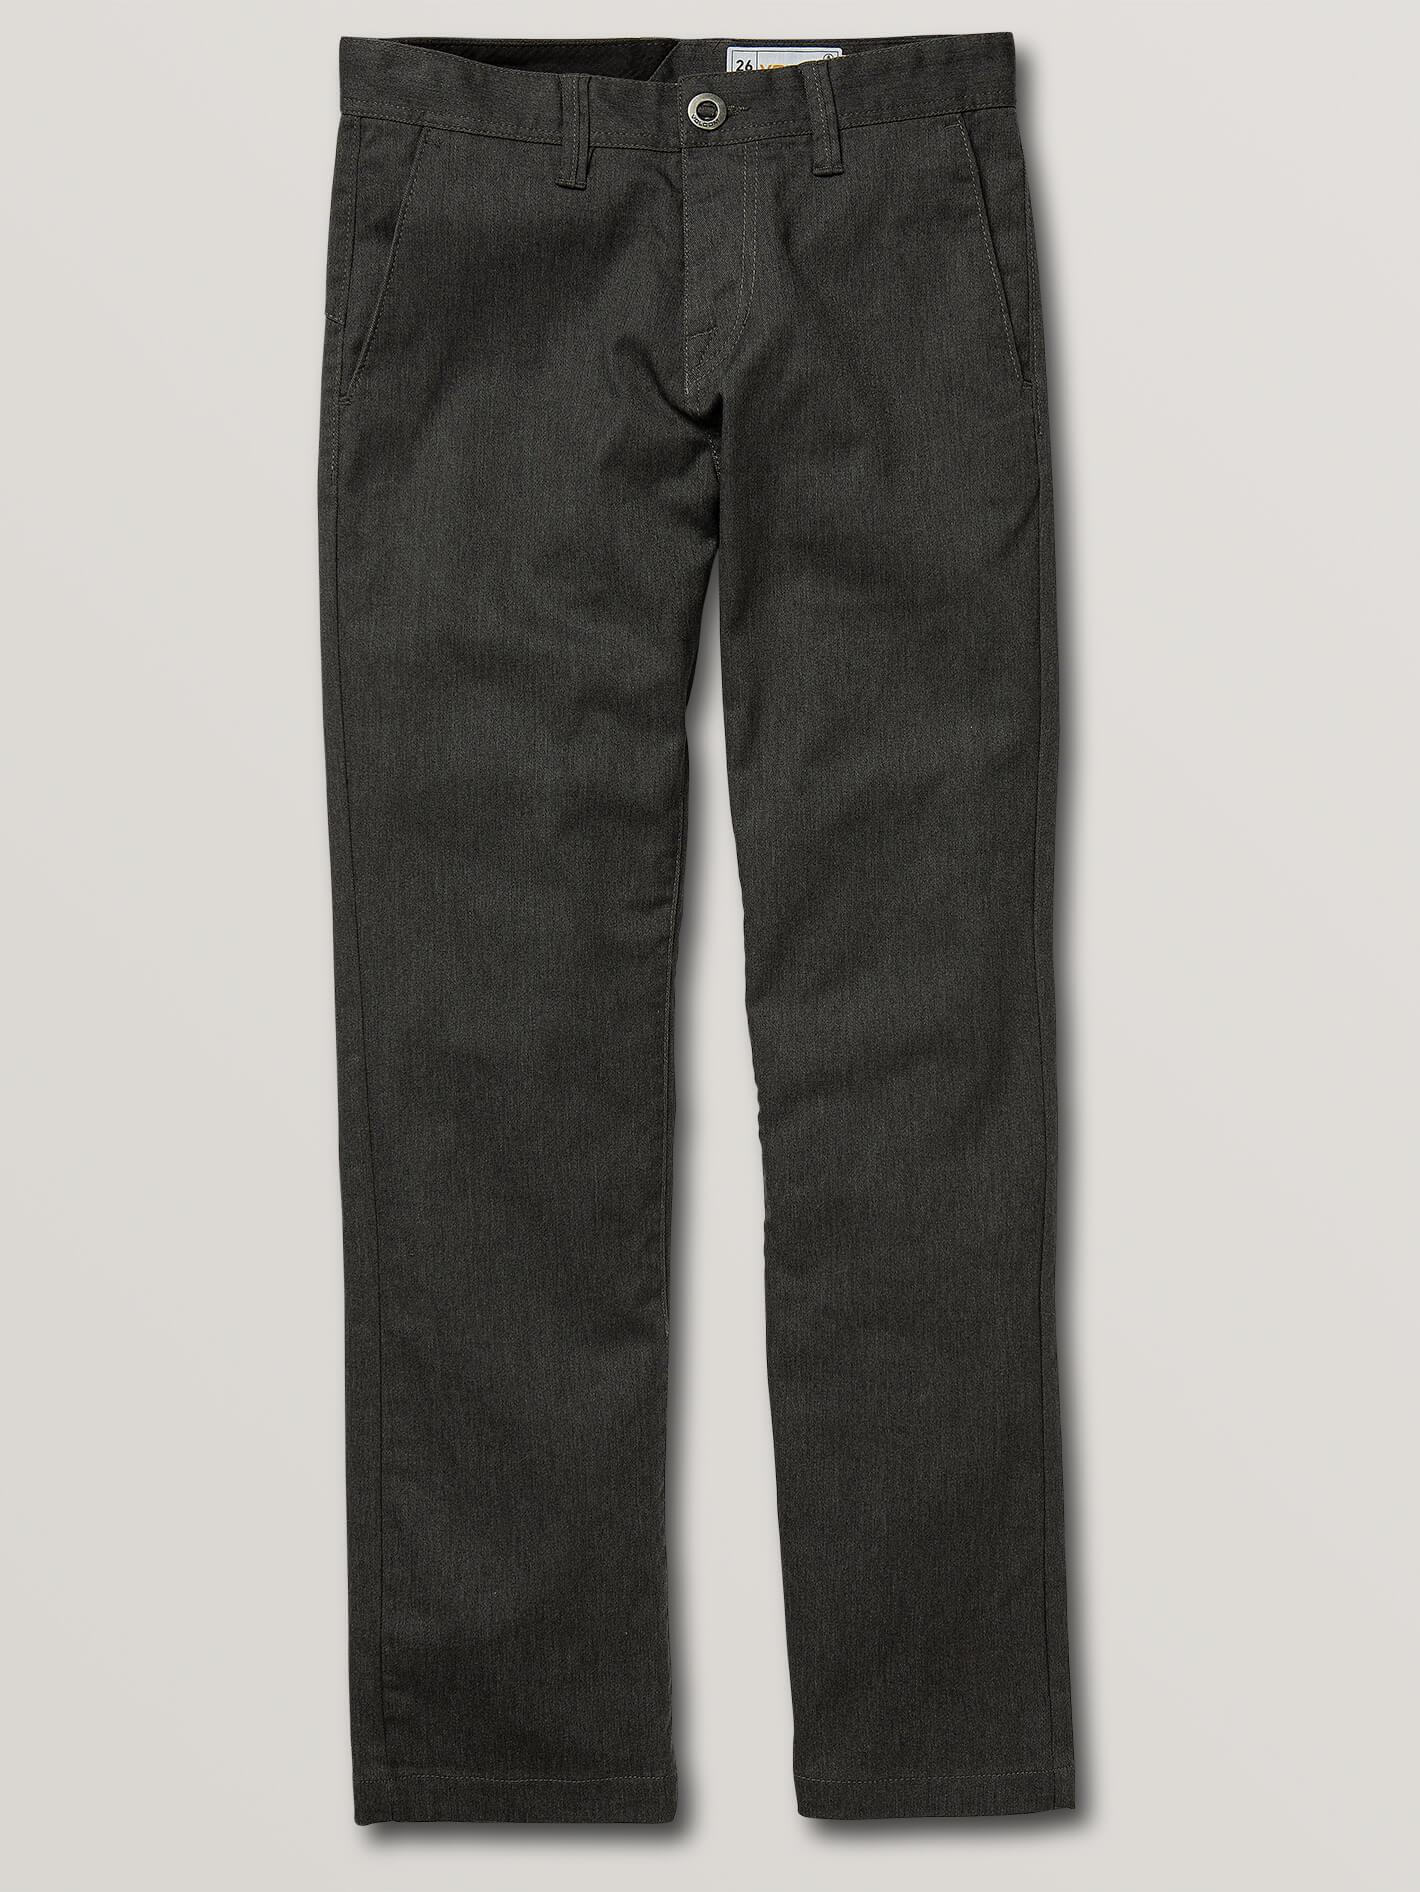 Big Boys Frickin Modern Stretch Chino Pants - Charcoal Heather - CHARCOAL HEATHER / 27